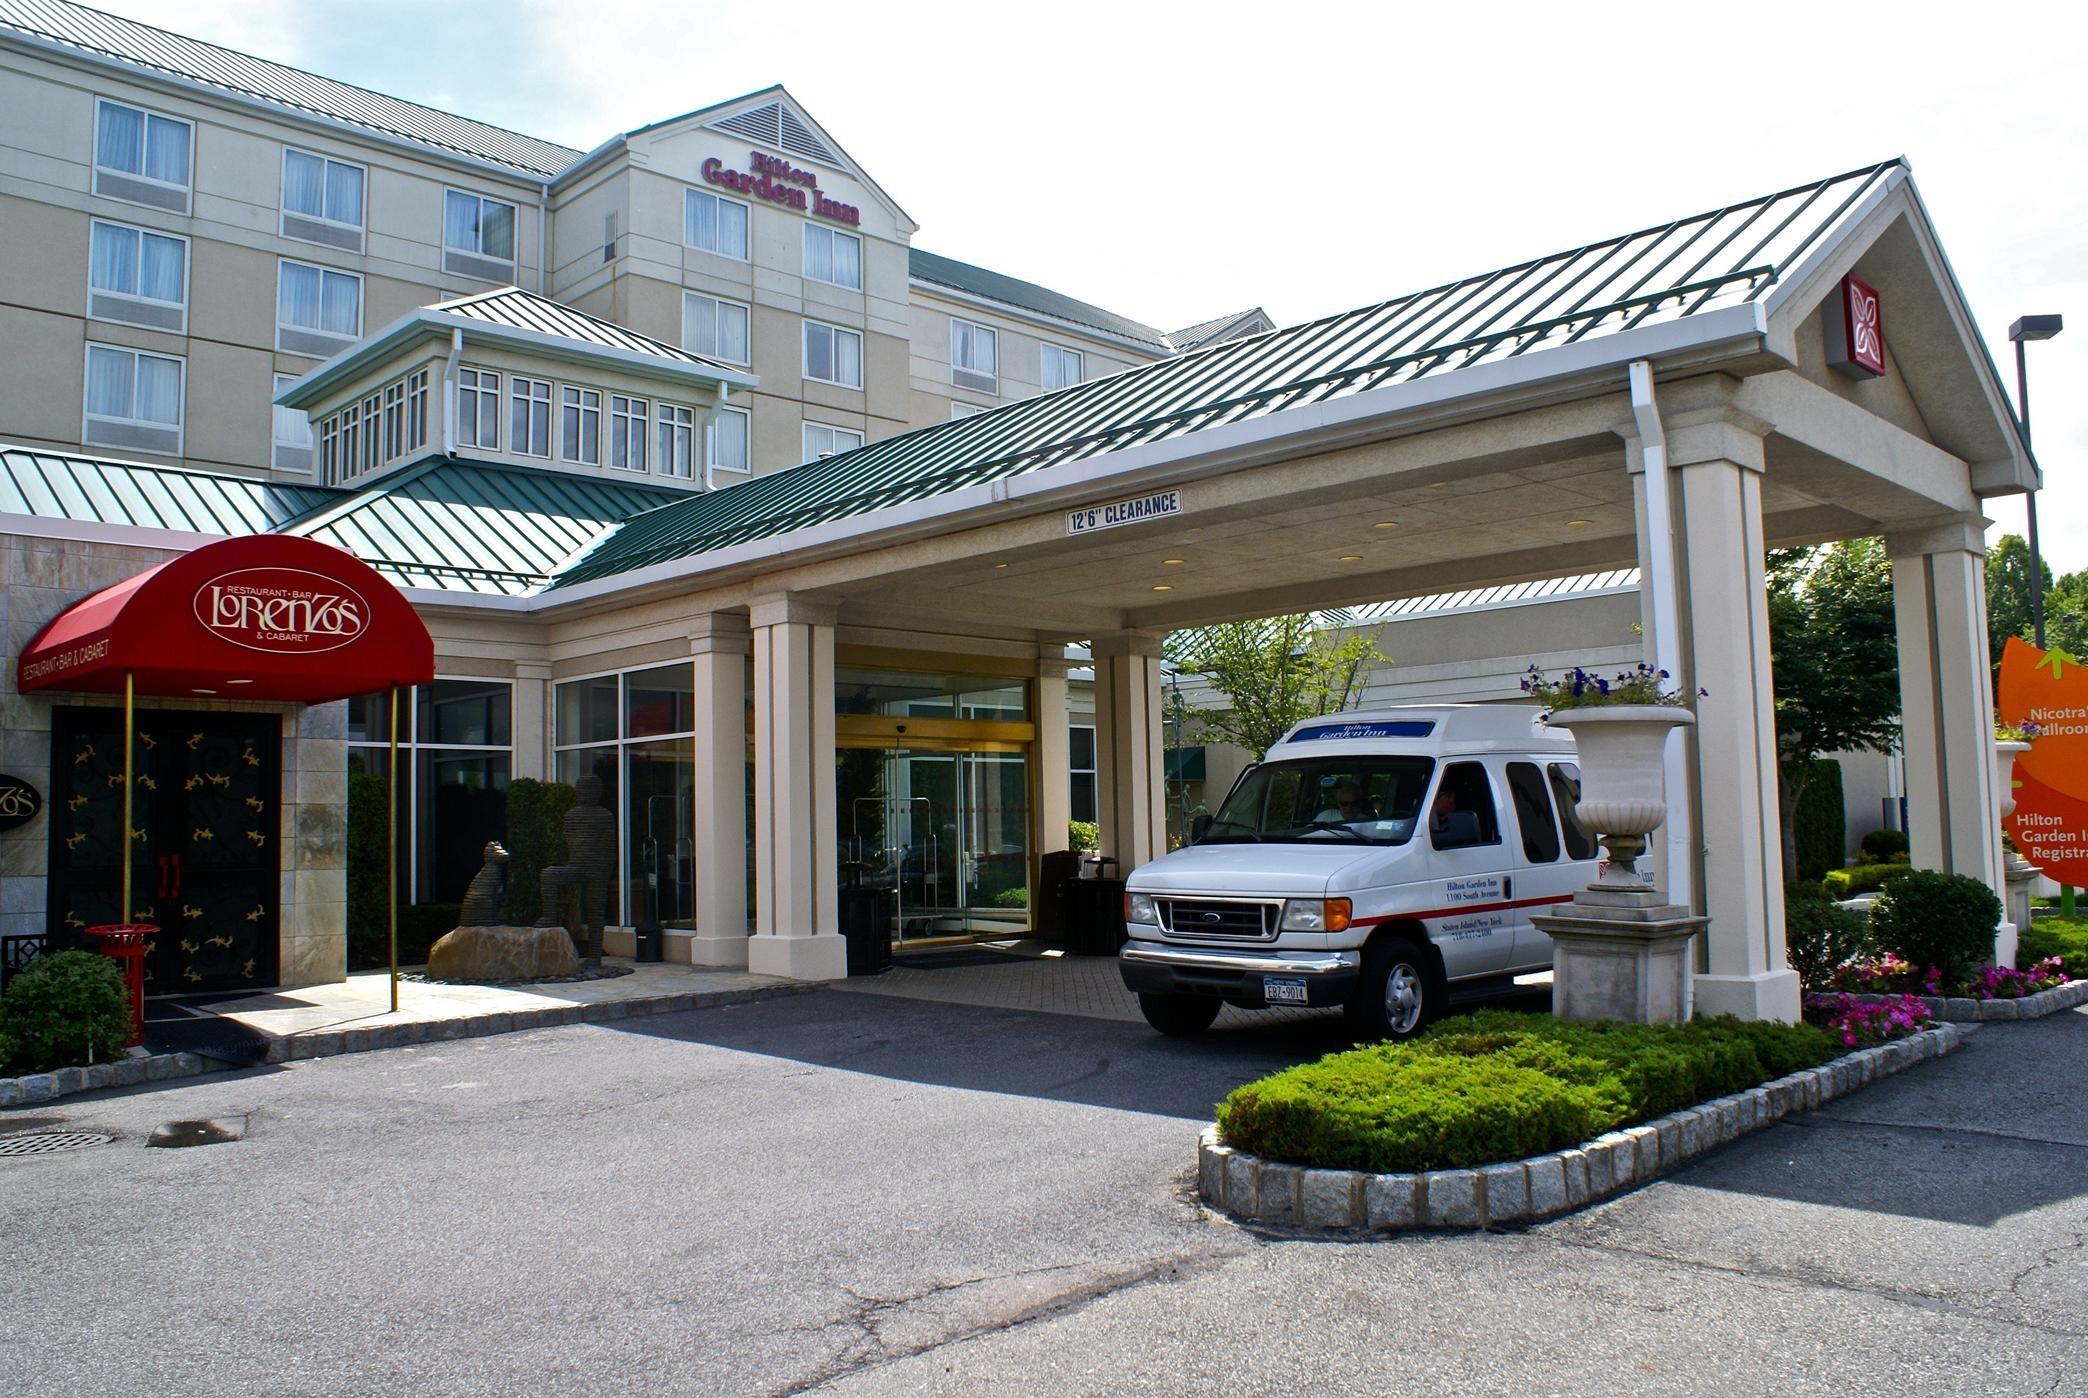 Hilton Entrance Way